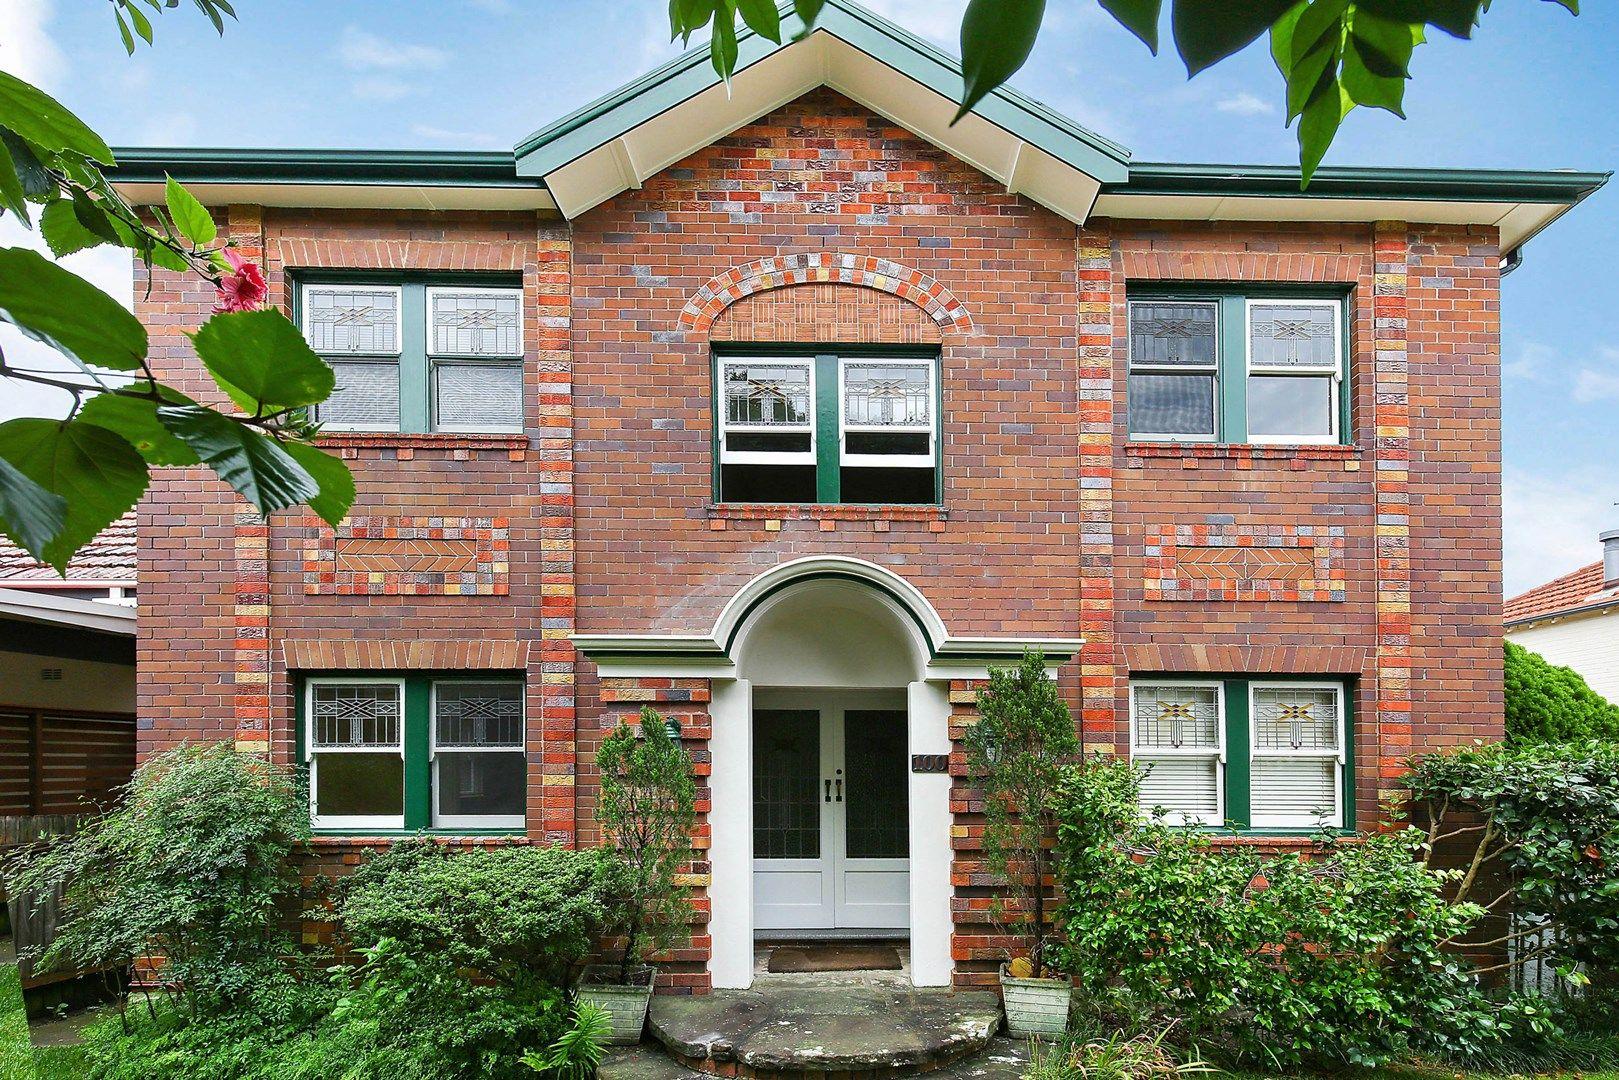 3/100 Shadforth Street, Mosman NSW 2088, Image 0